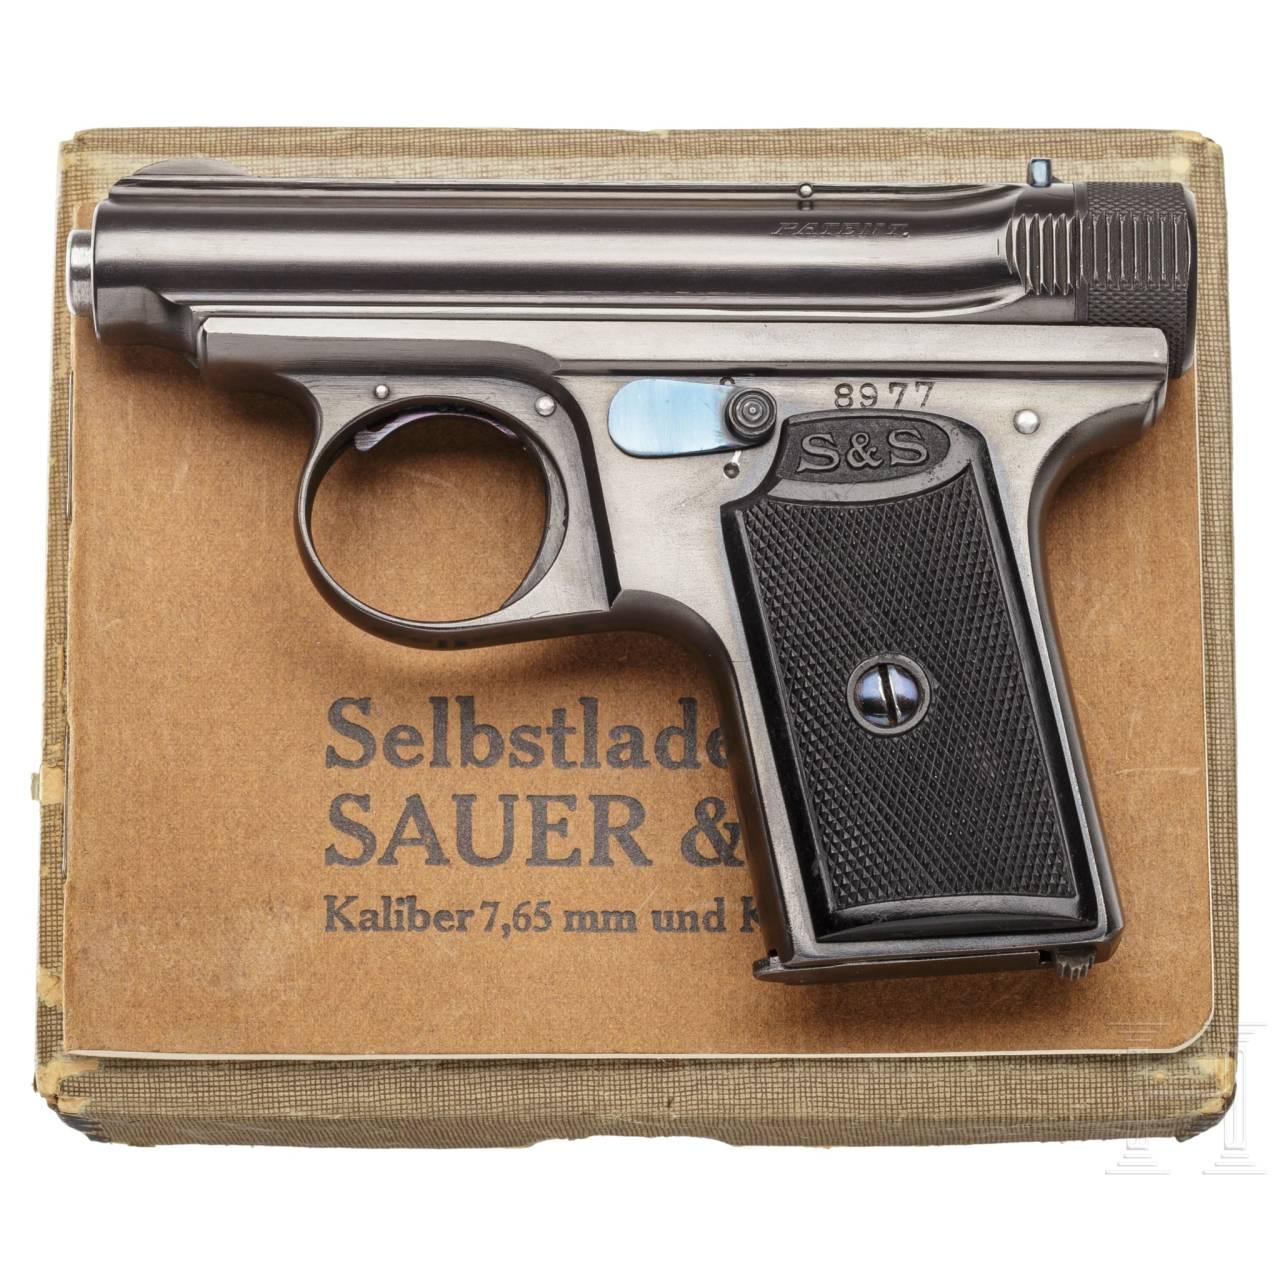 Sauer & Sohn Mod. 19, 1. Ausführung, im Karton